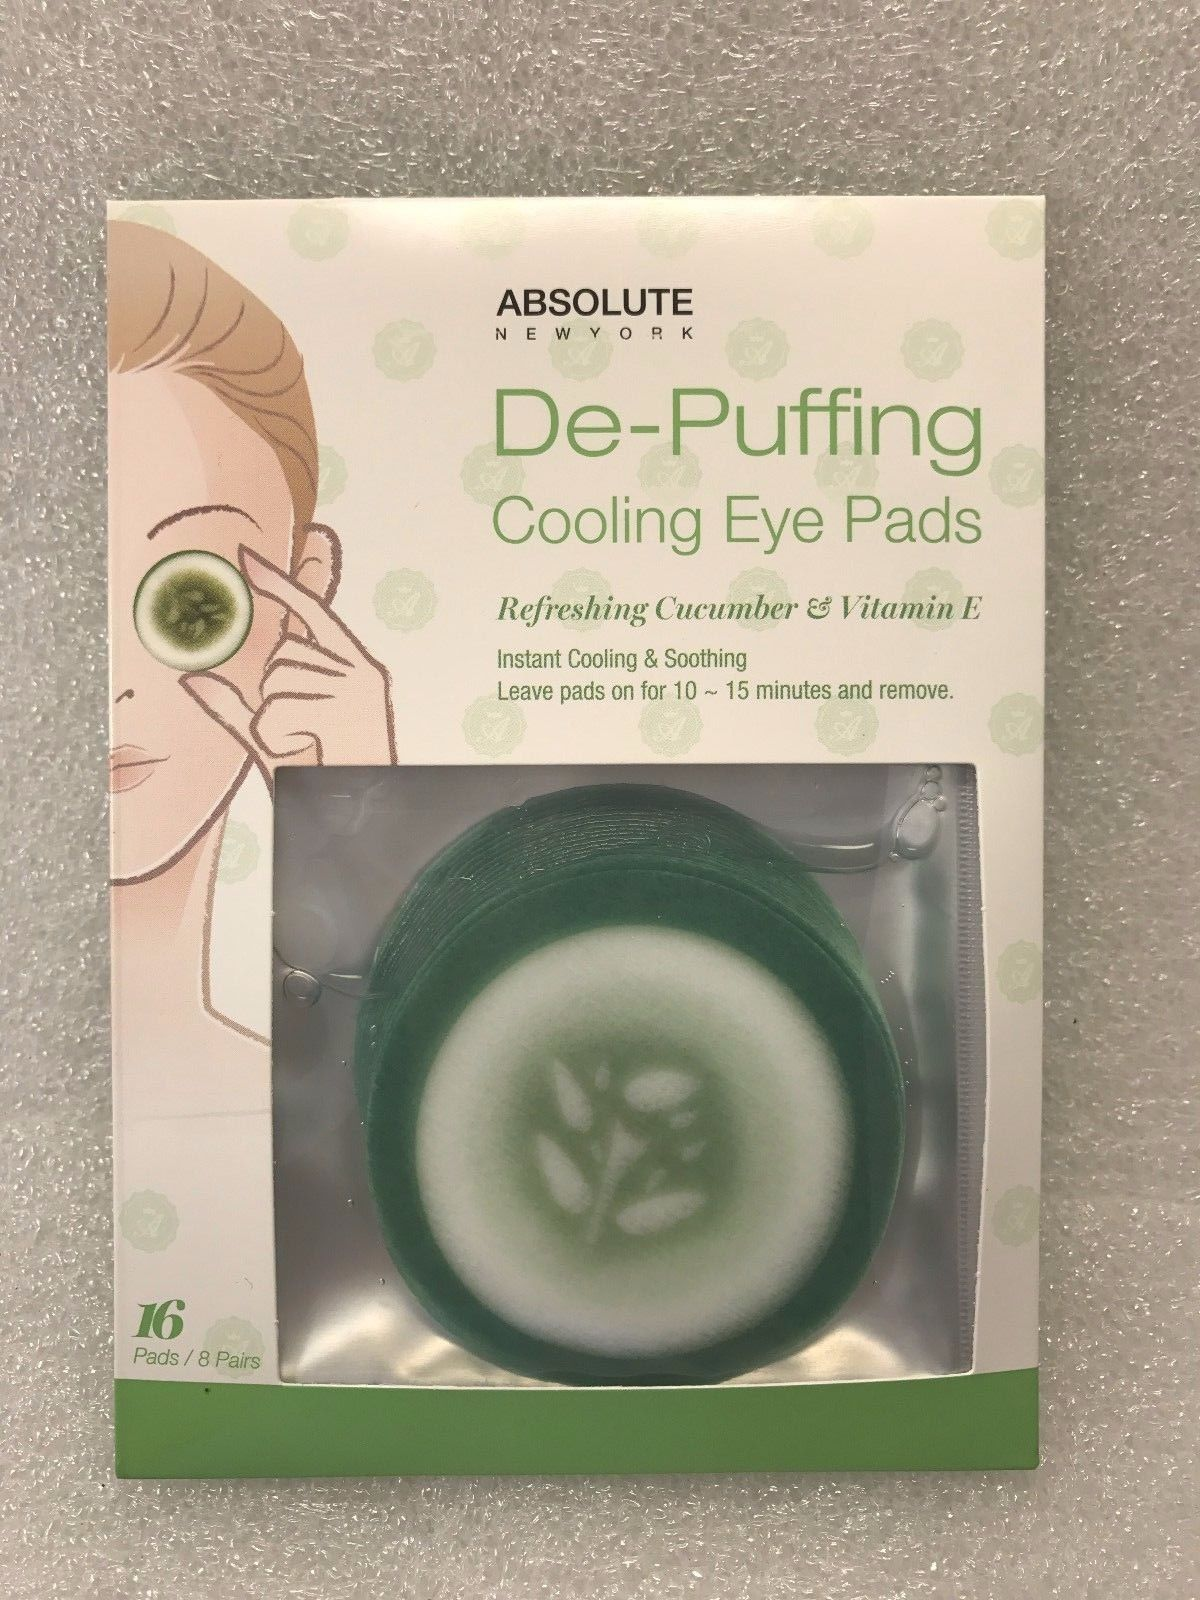 Absolute York De Puffing Cooling Eye Pads Refreshing Cucumber